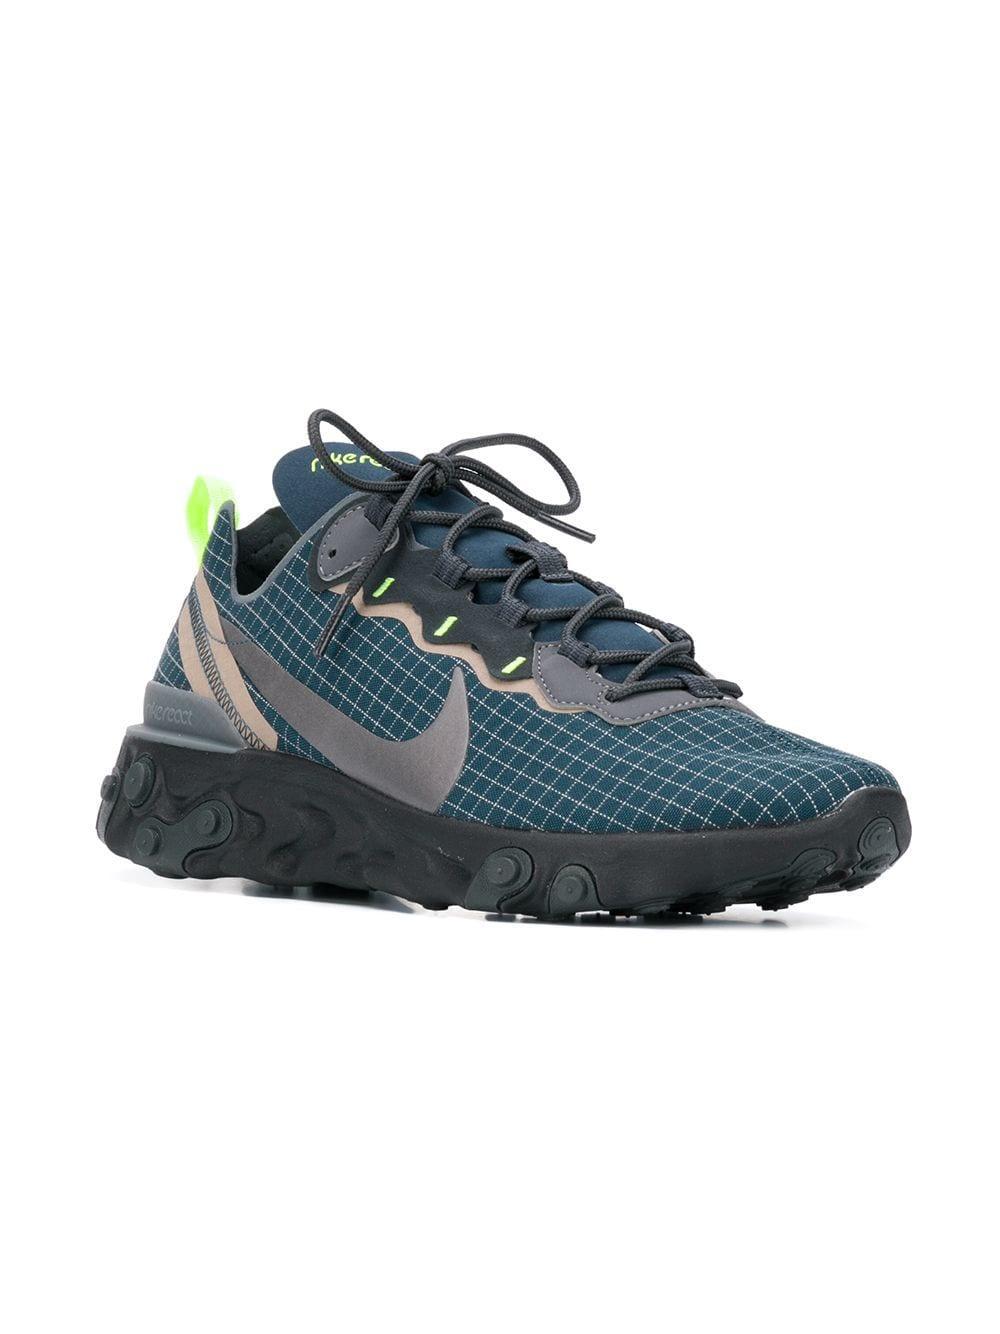 c9cbd05e90f5 Lyst - Nike React Element 87 Sneakers in Blue for Men